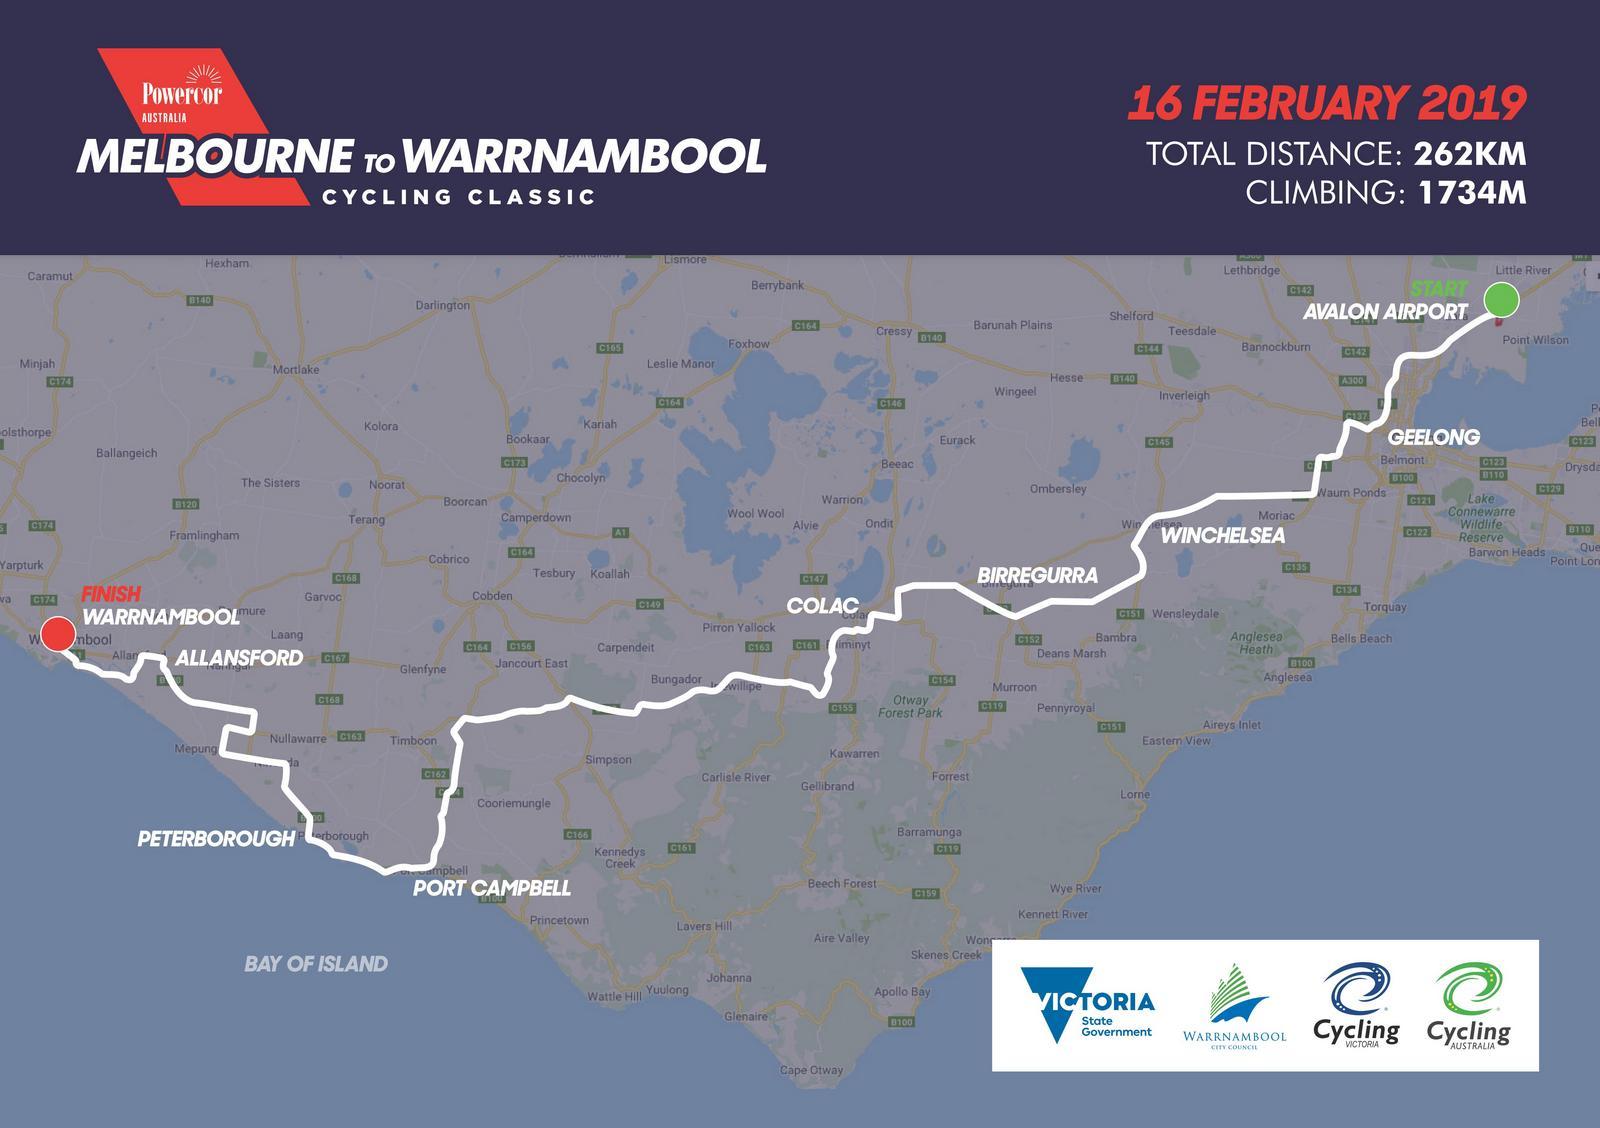 2019-melbourne-to-warrnambool-map.jpg